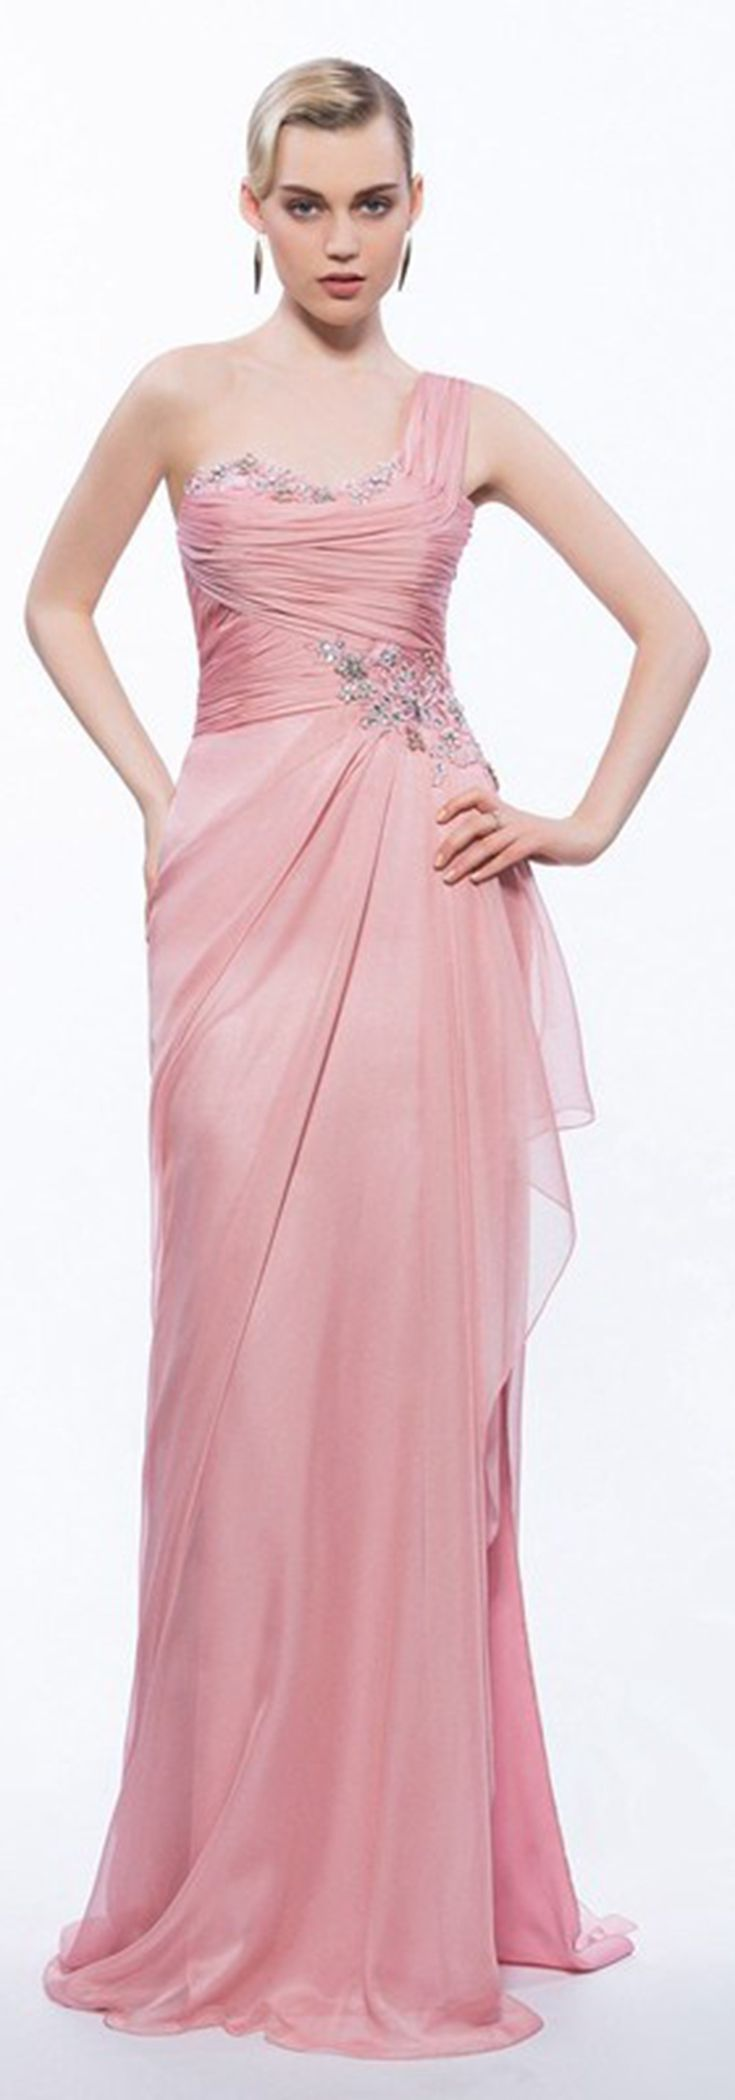 Mejores 80 imágenes de Pink Prom Dresses en Pinterest   Vestidos de ...